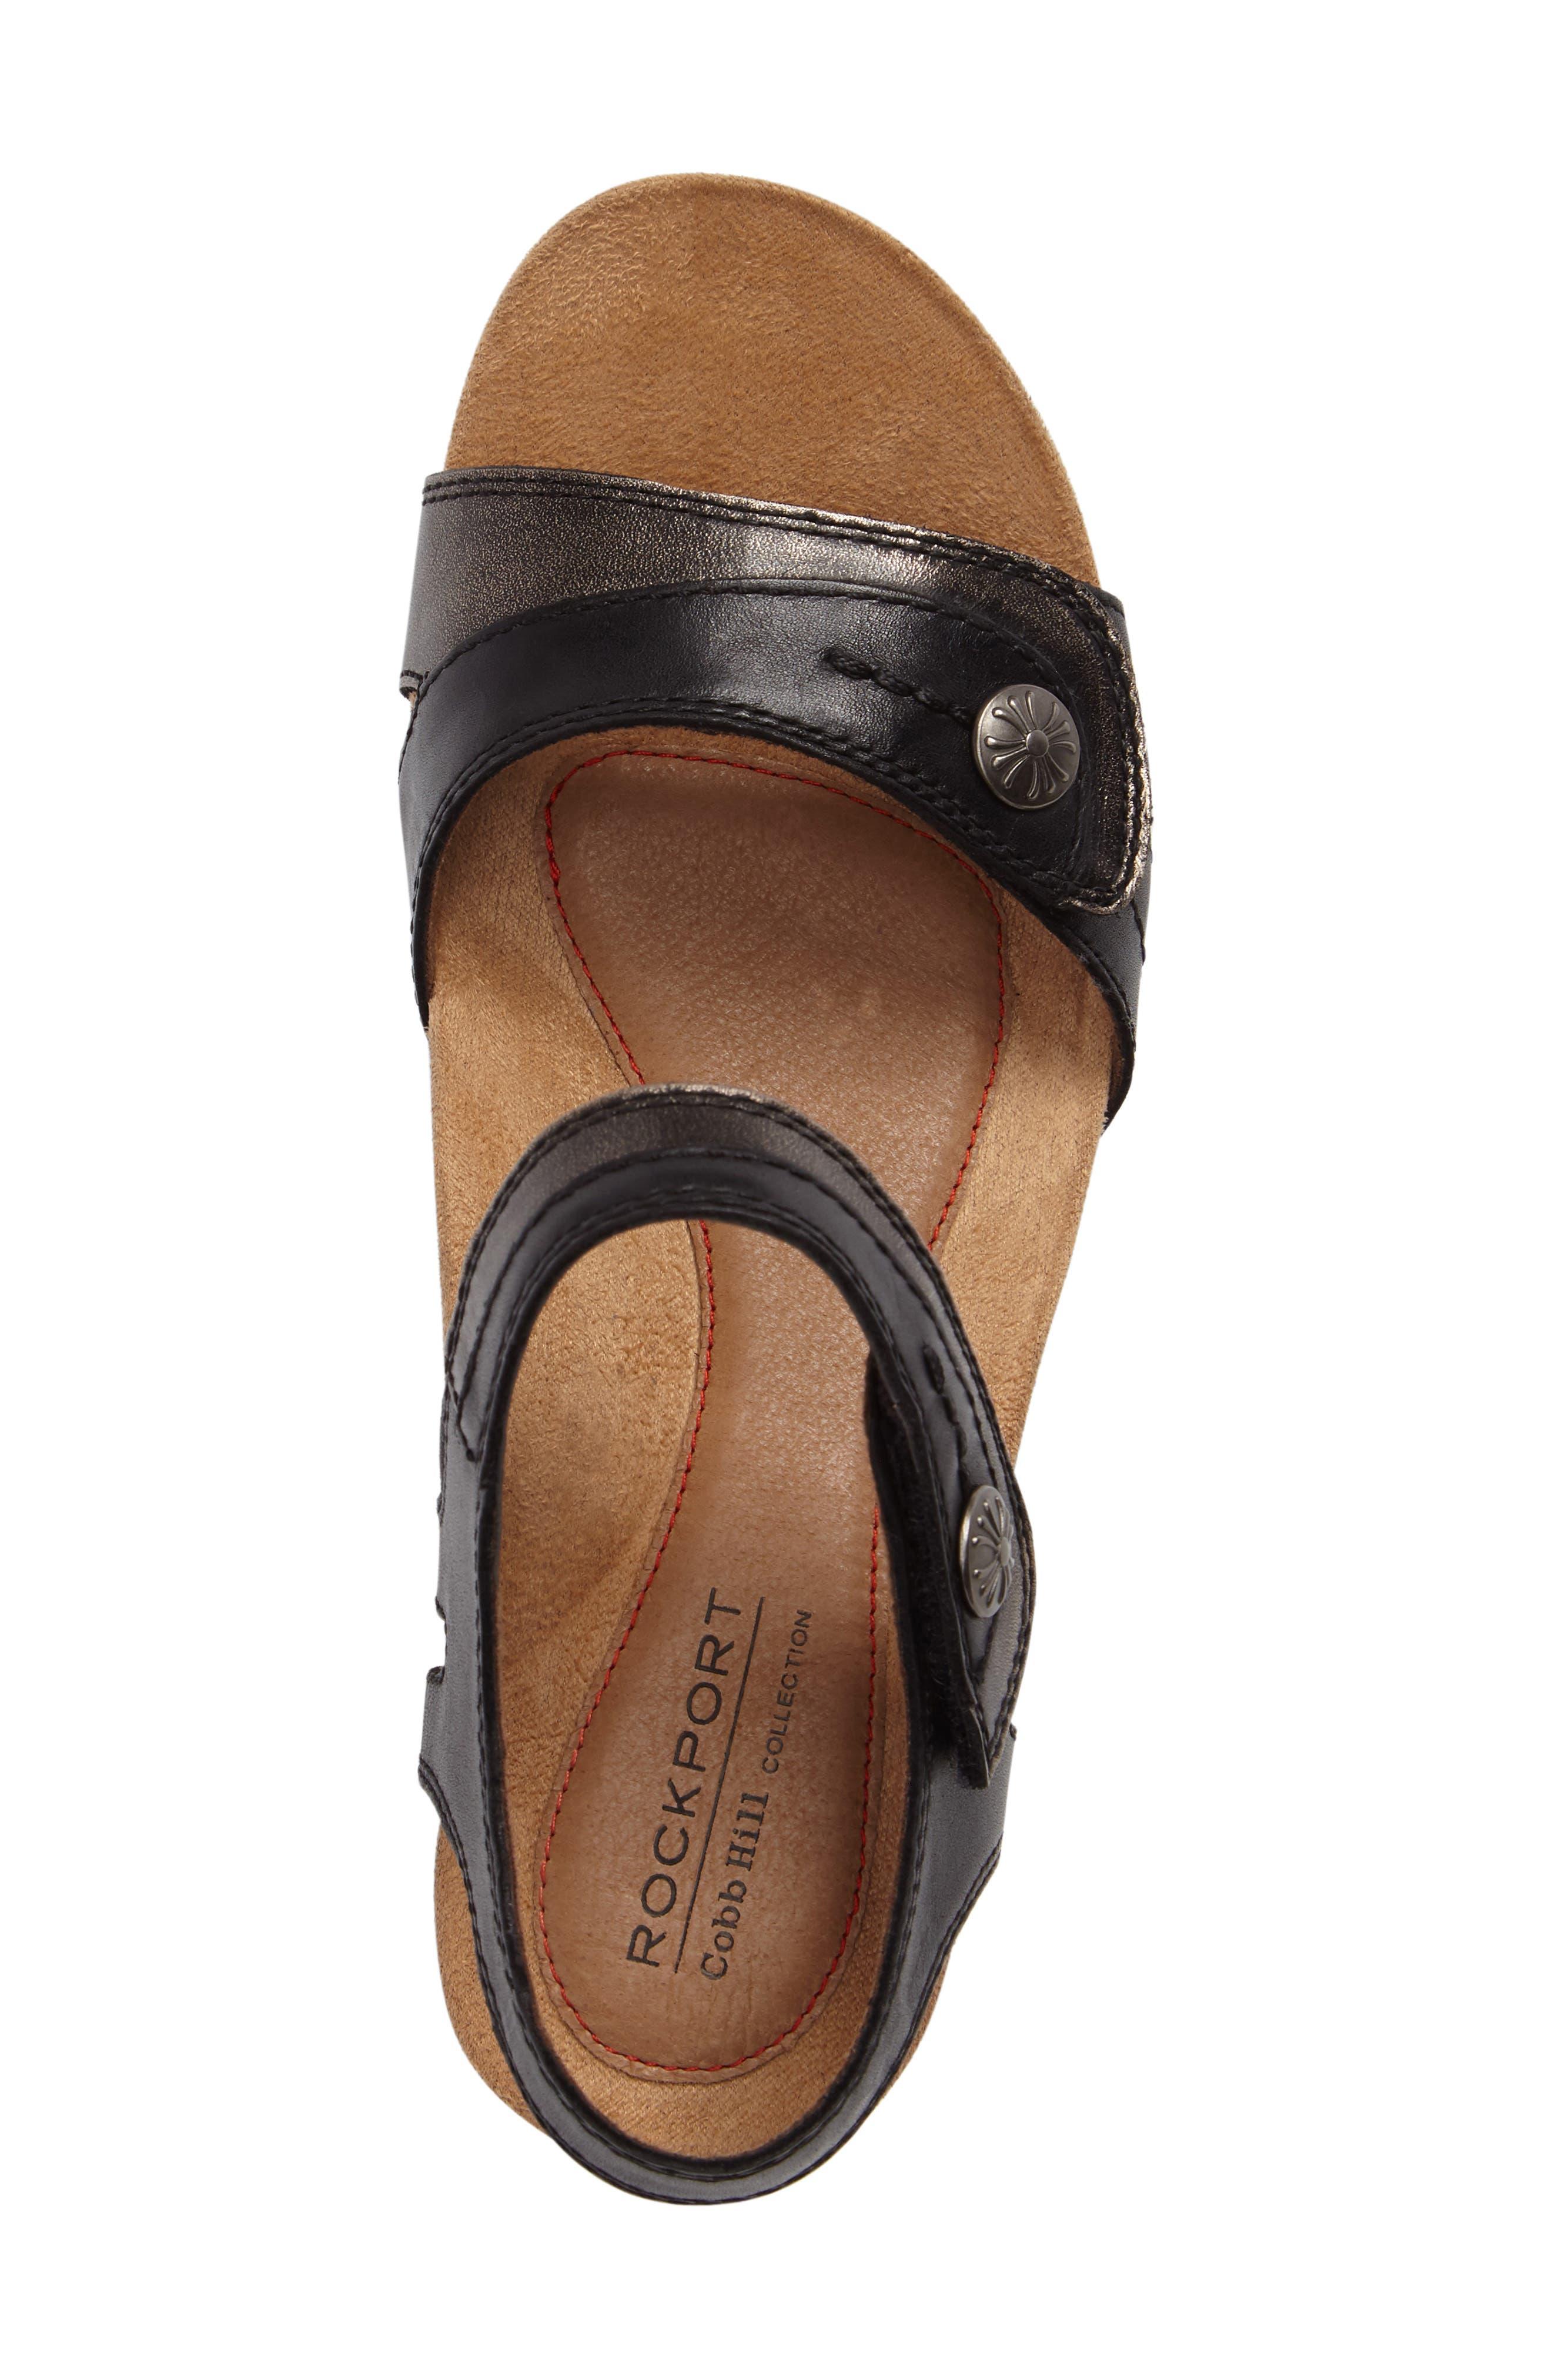 Hollywood Wedge Sandal,                             Alternate thumbnail 5, color,                             BLACK LEATHER